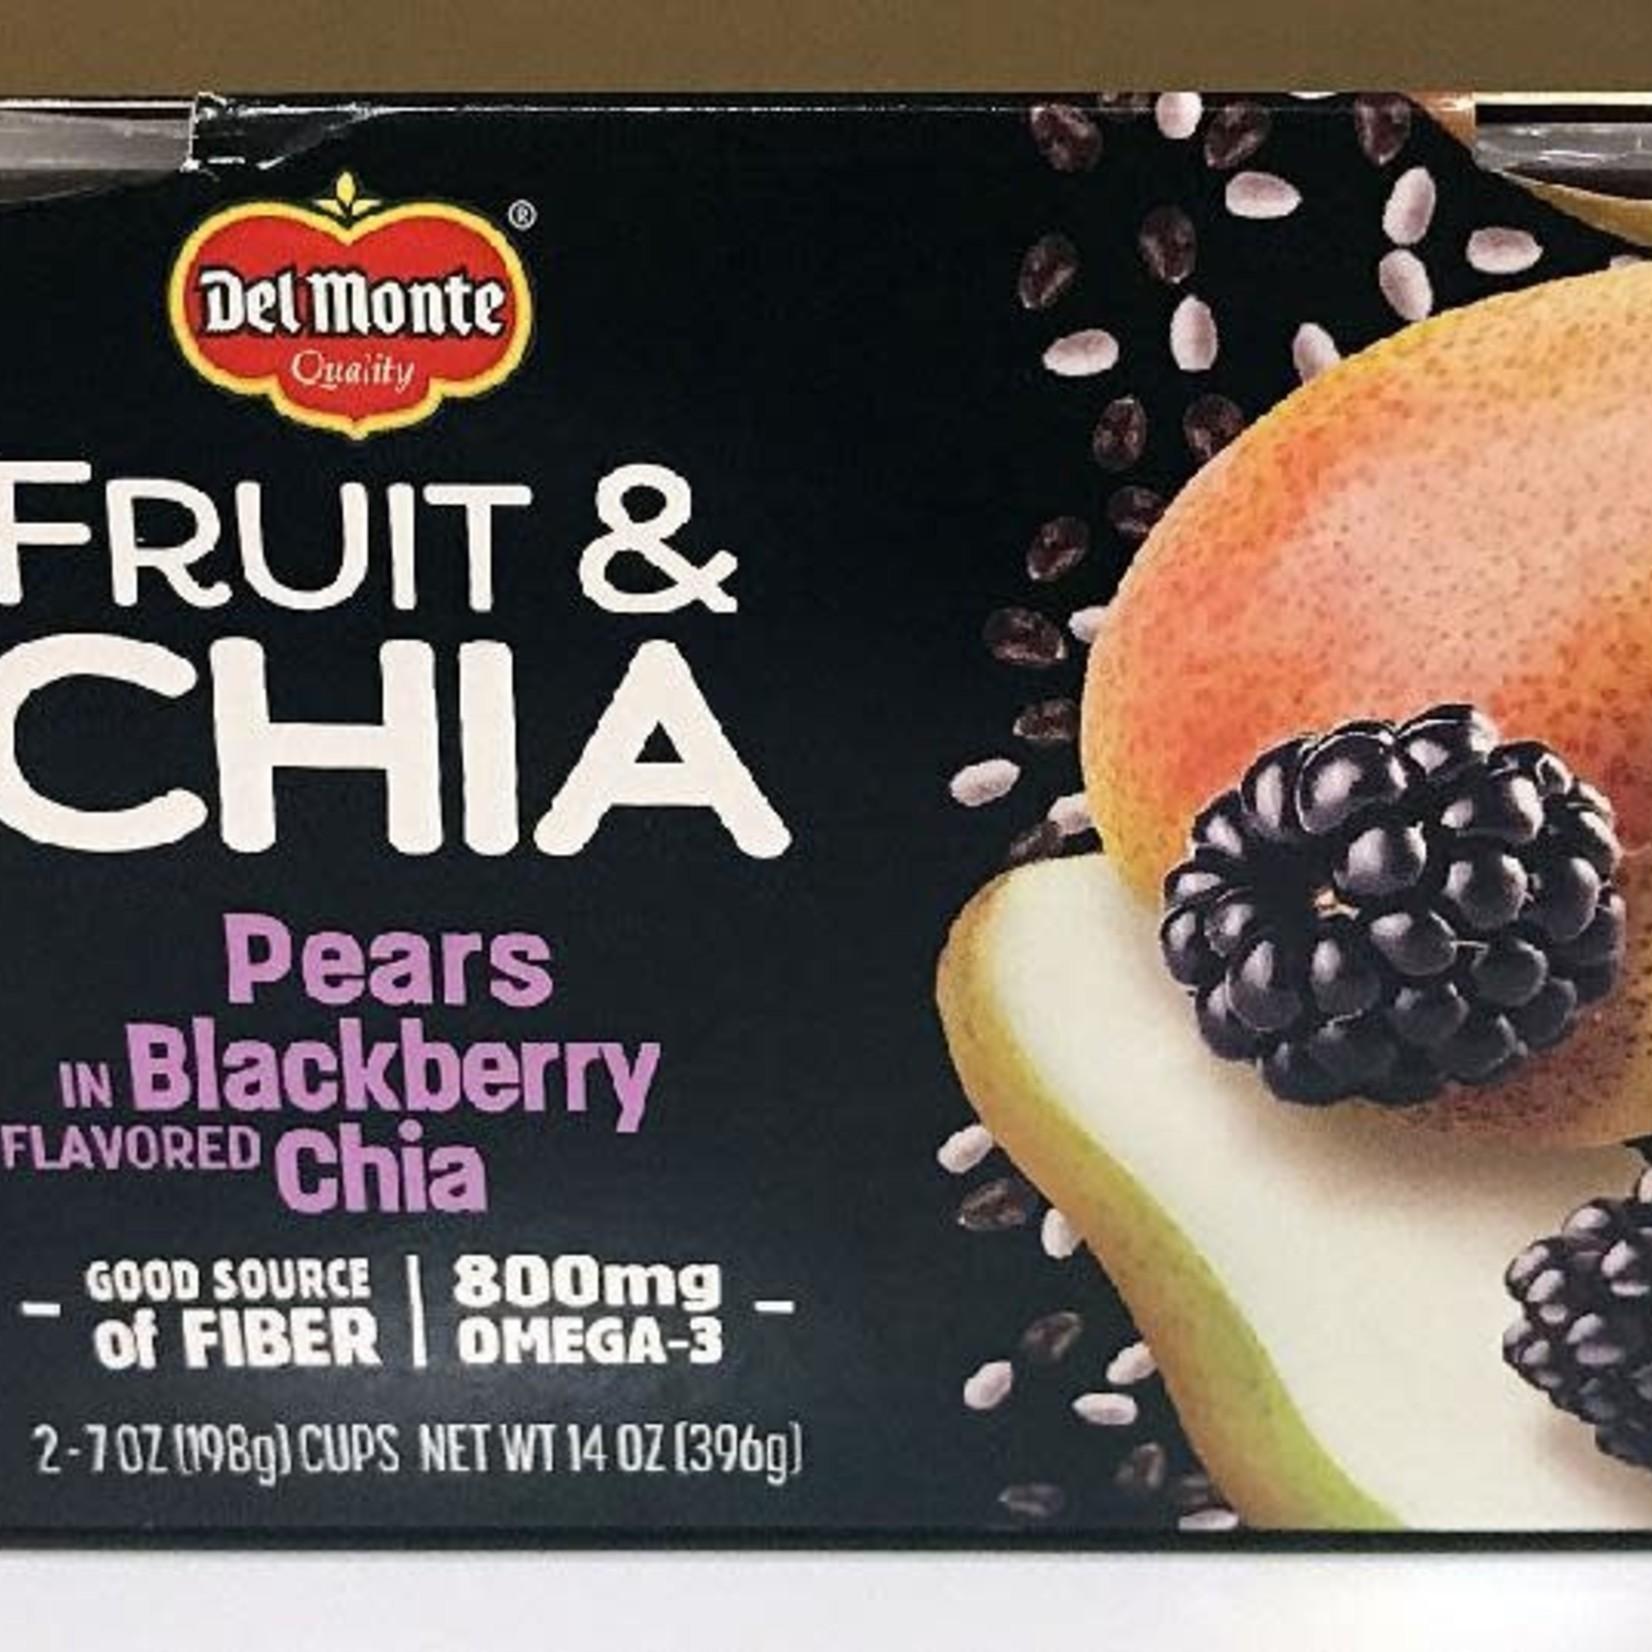 Del Monte Fruit & Chia Pears in Blackberry Flavoured Chia 2x198g